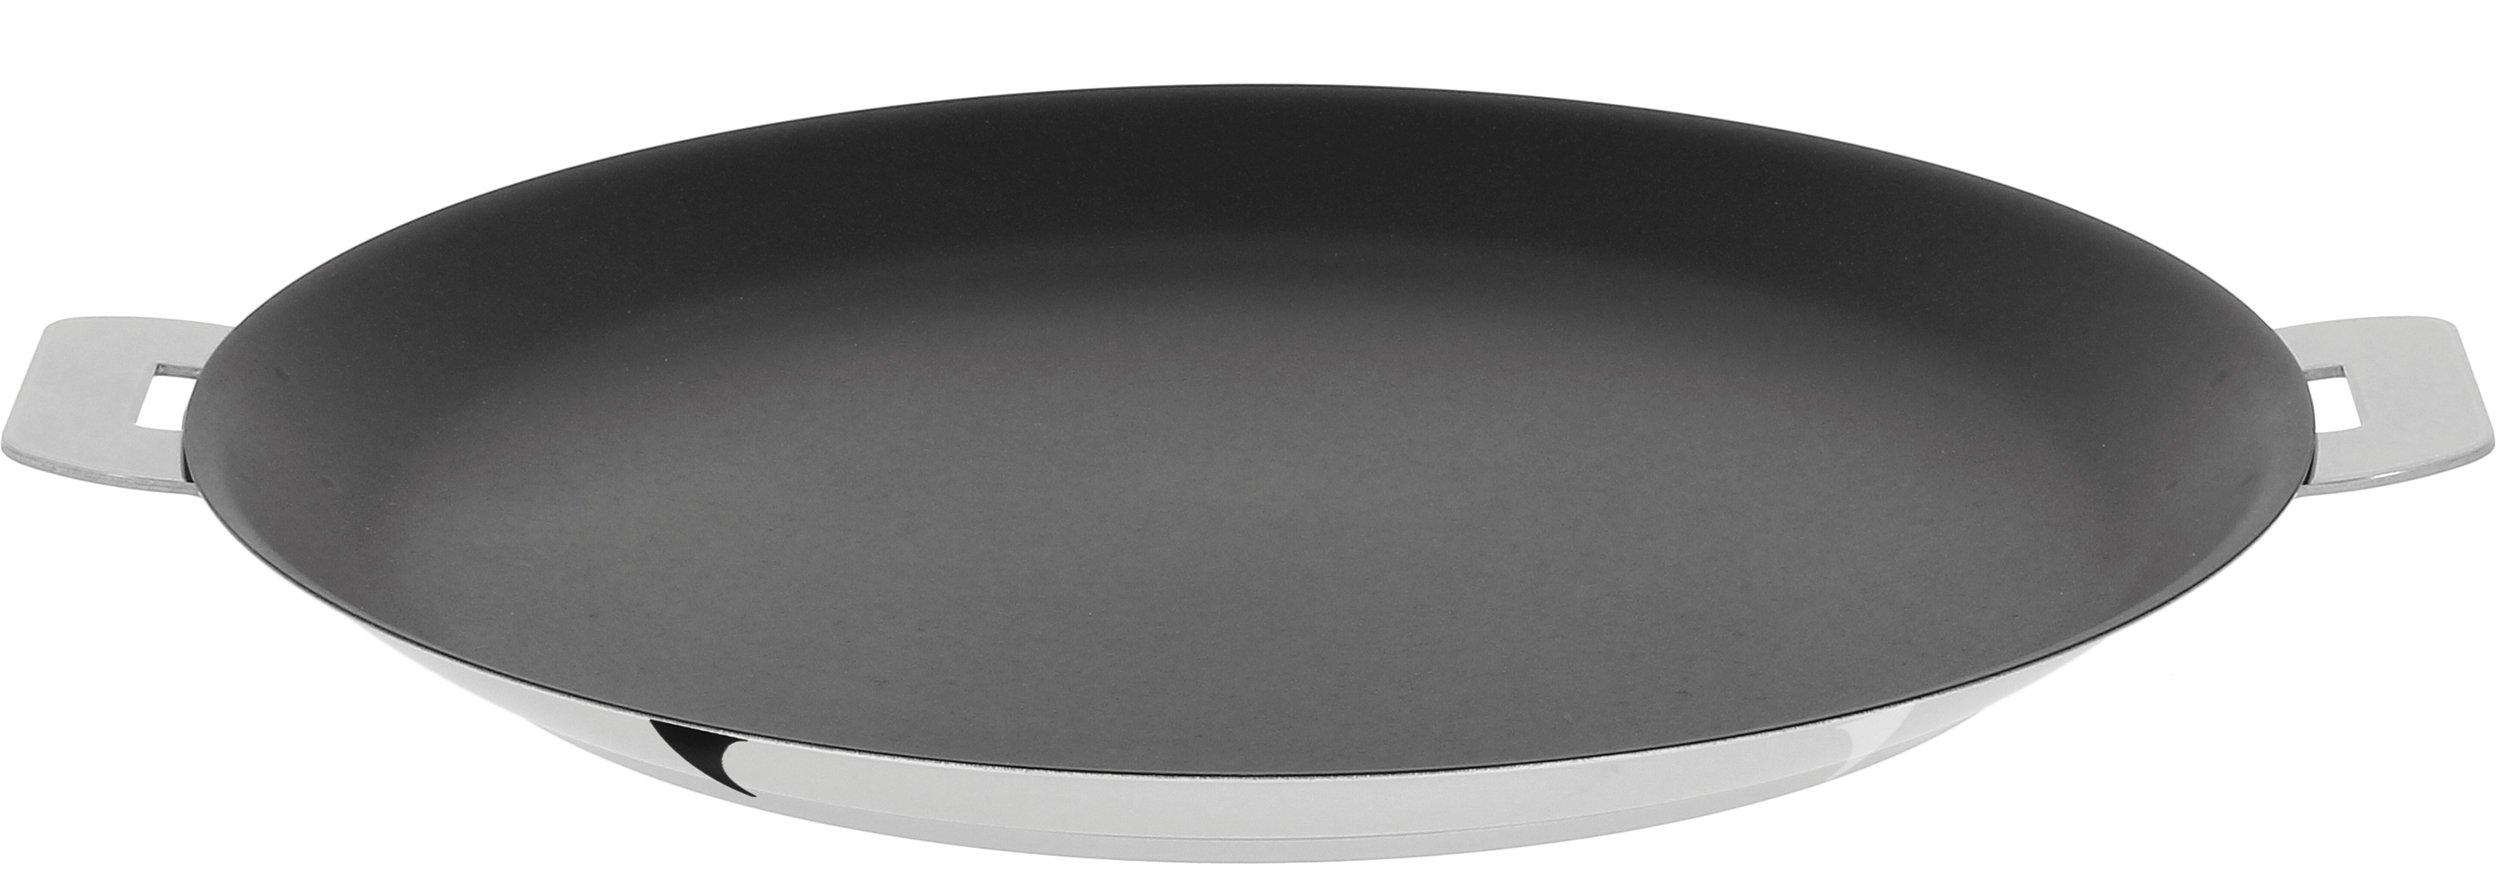 Cristel Mutine CR30QE Crepe pan, 12'', Silver